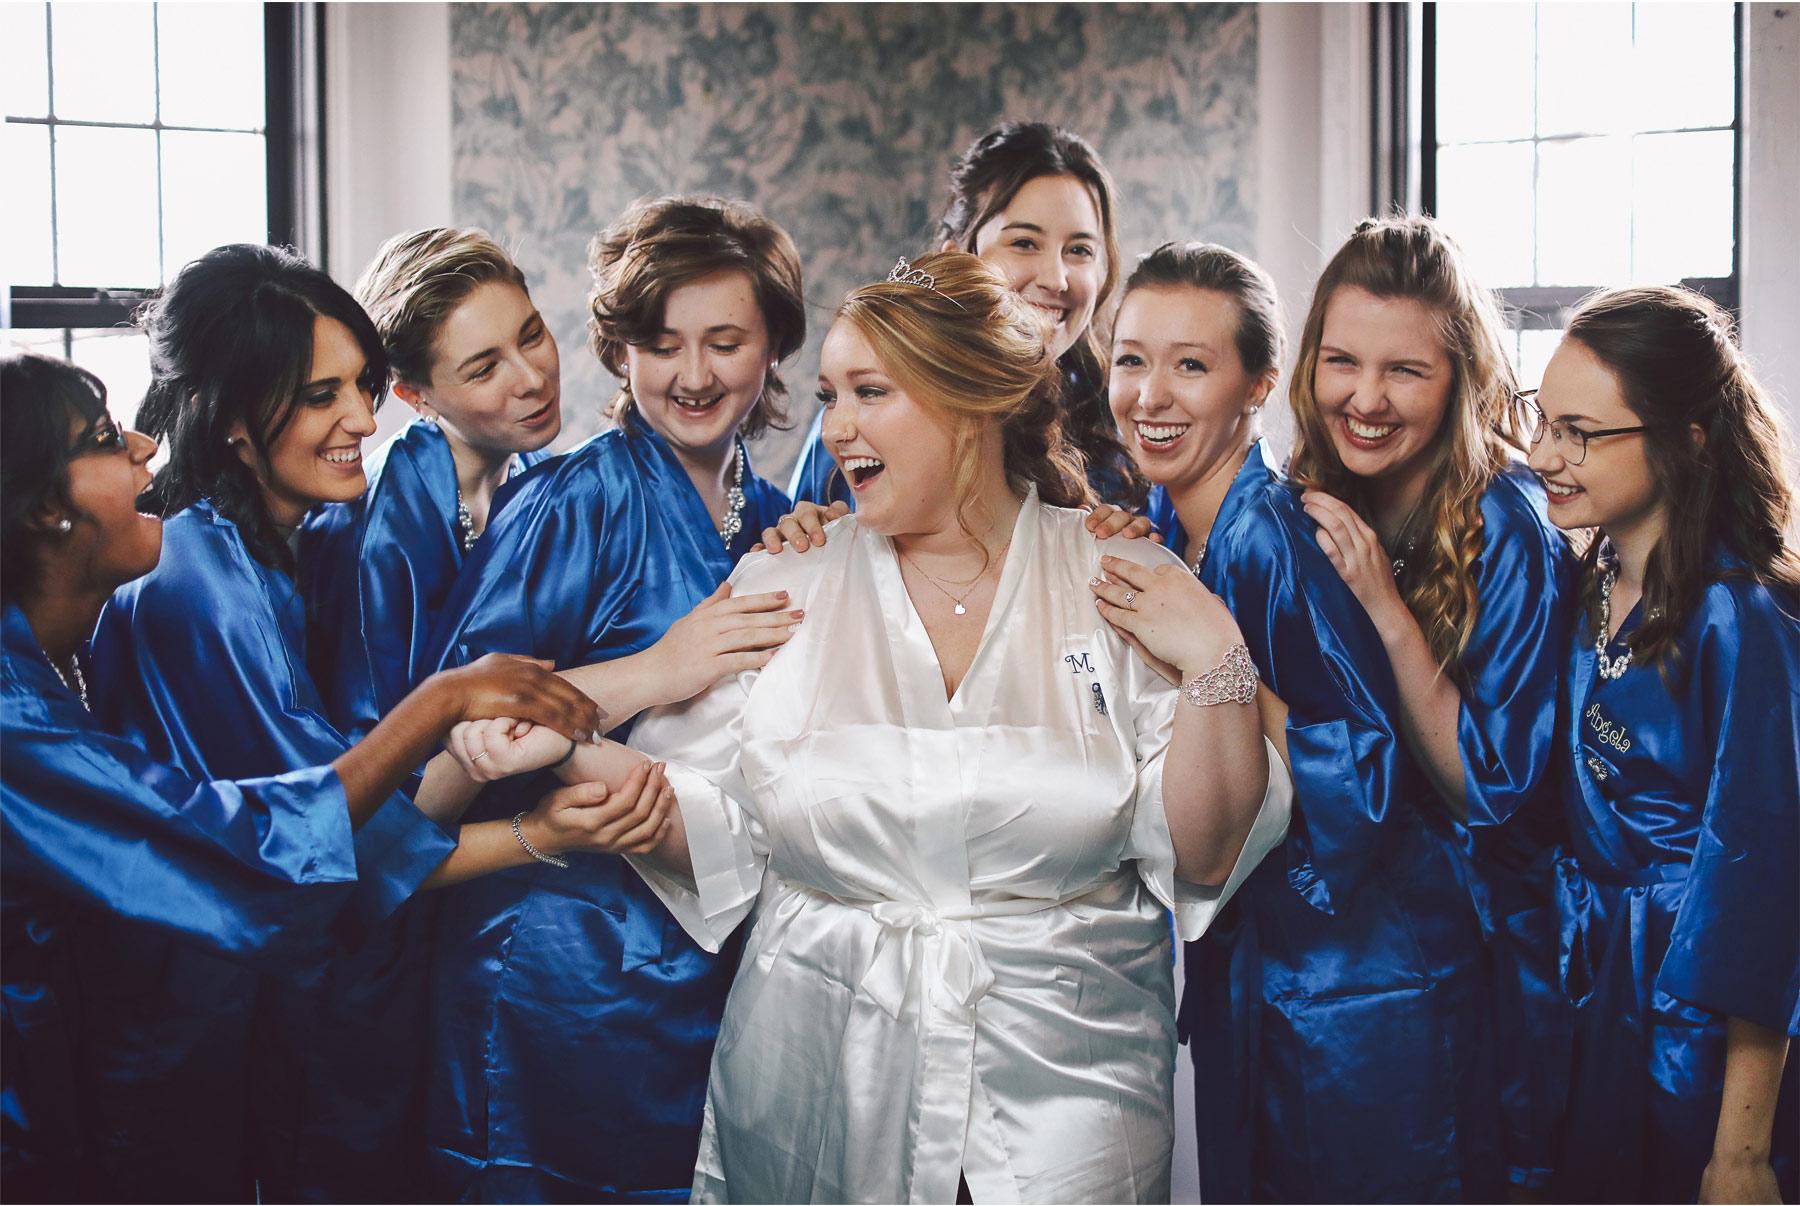 02-Saint-Paul-Minnesota-Wedding-Photography-by-Vick-Photography-The-University-Club-Bridesmaids-Robes-Mari-and-Giuseppe.jpg